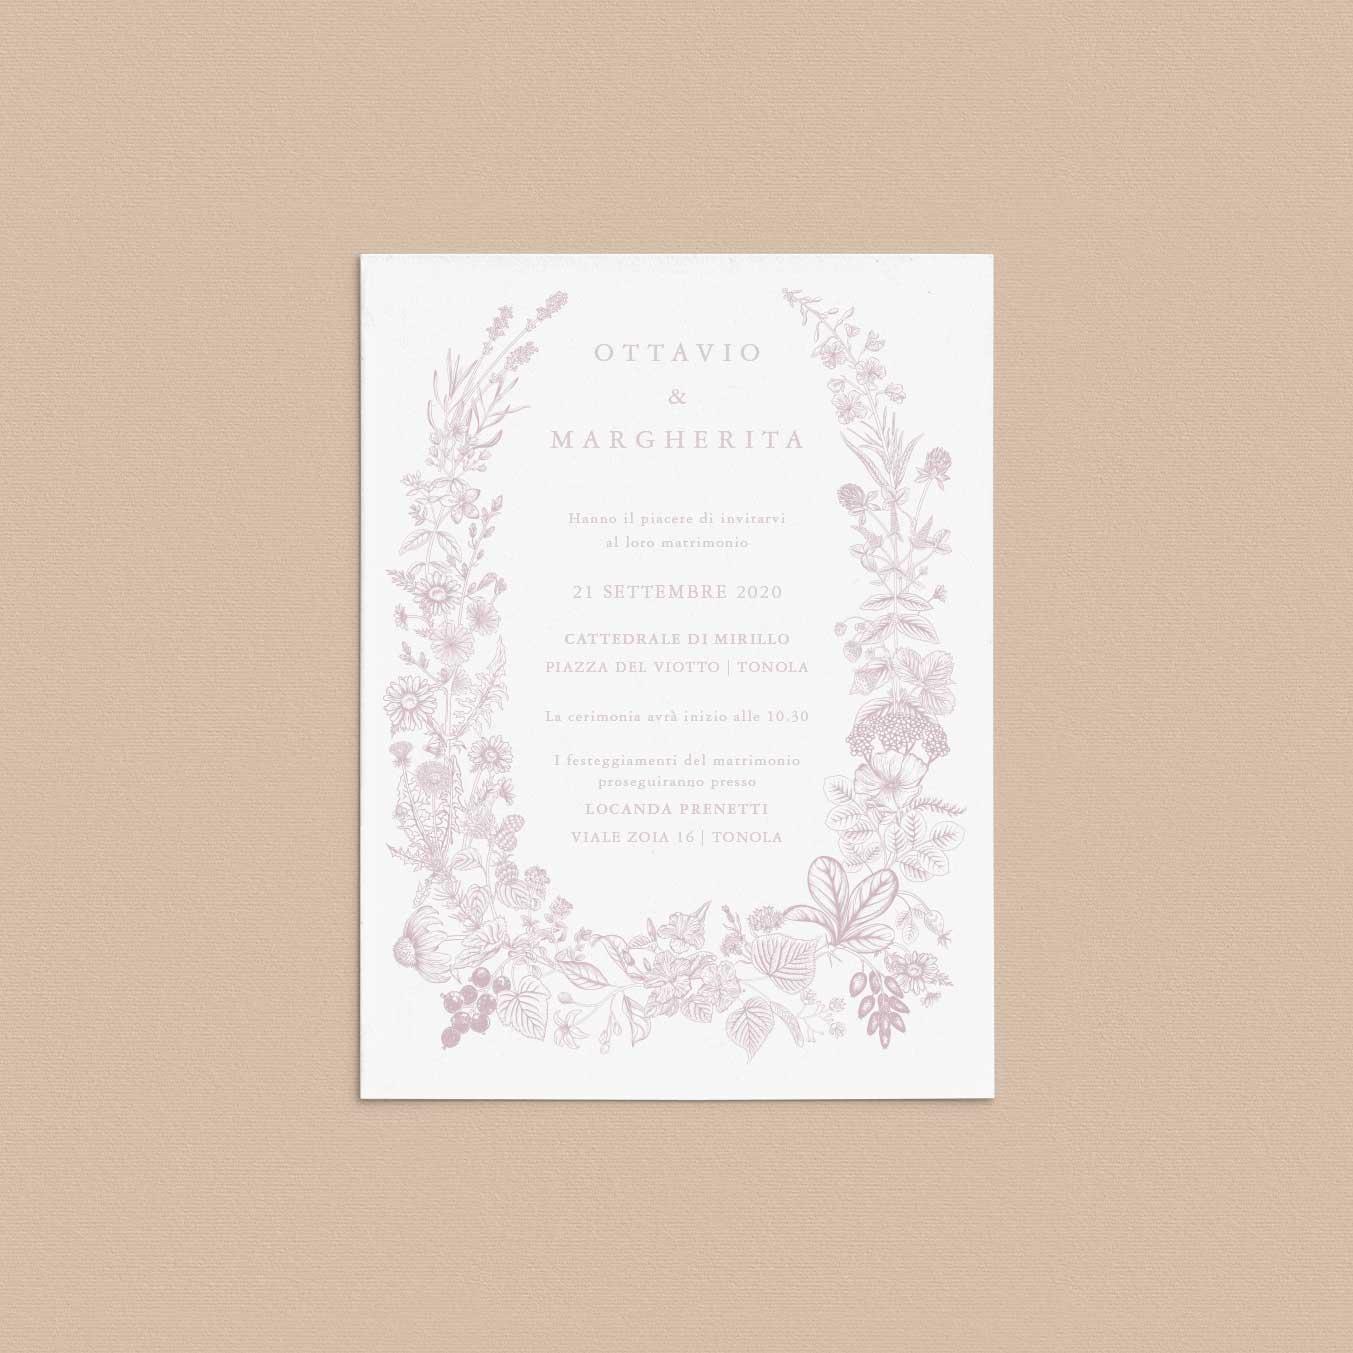 Partecipazioni-matrimonio-inviti-nozze-fiori-ghirlanda-ghirlande-fiore-natura-shabby-chic-green-rustic-boho-chic